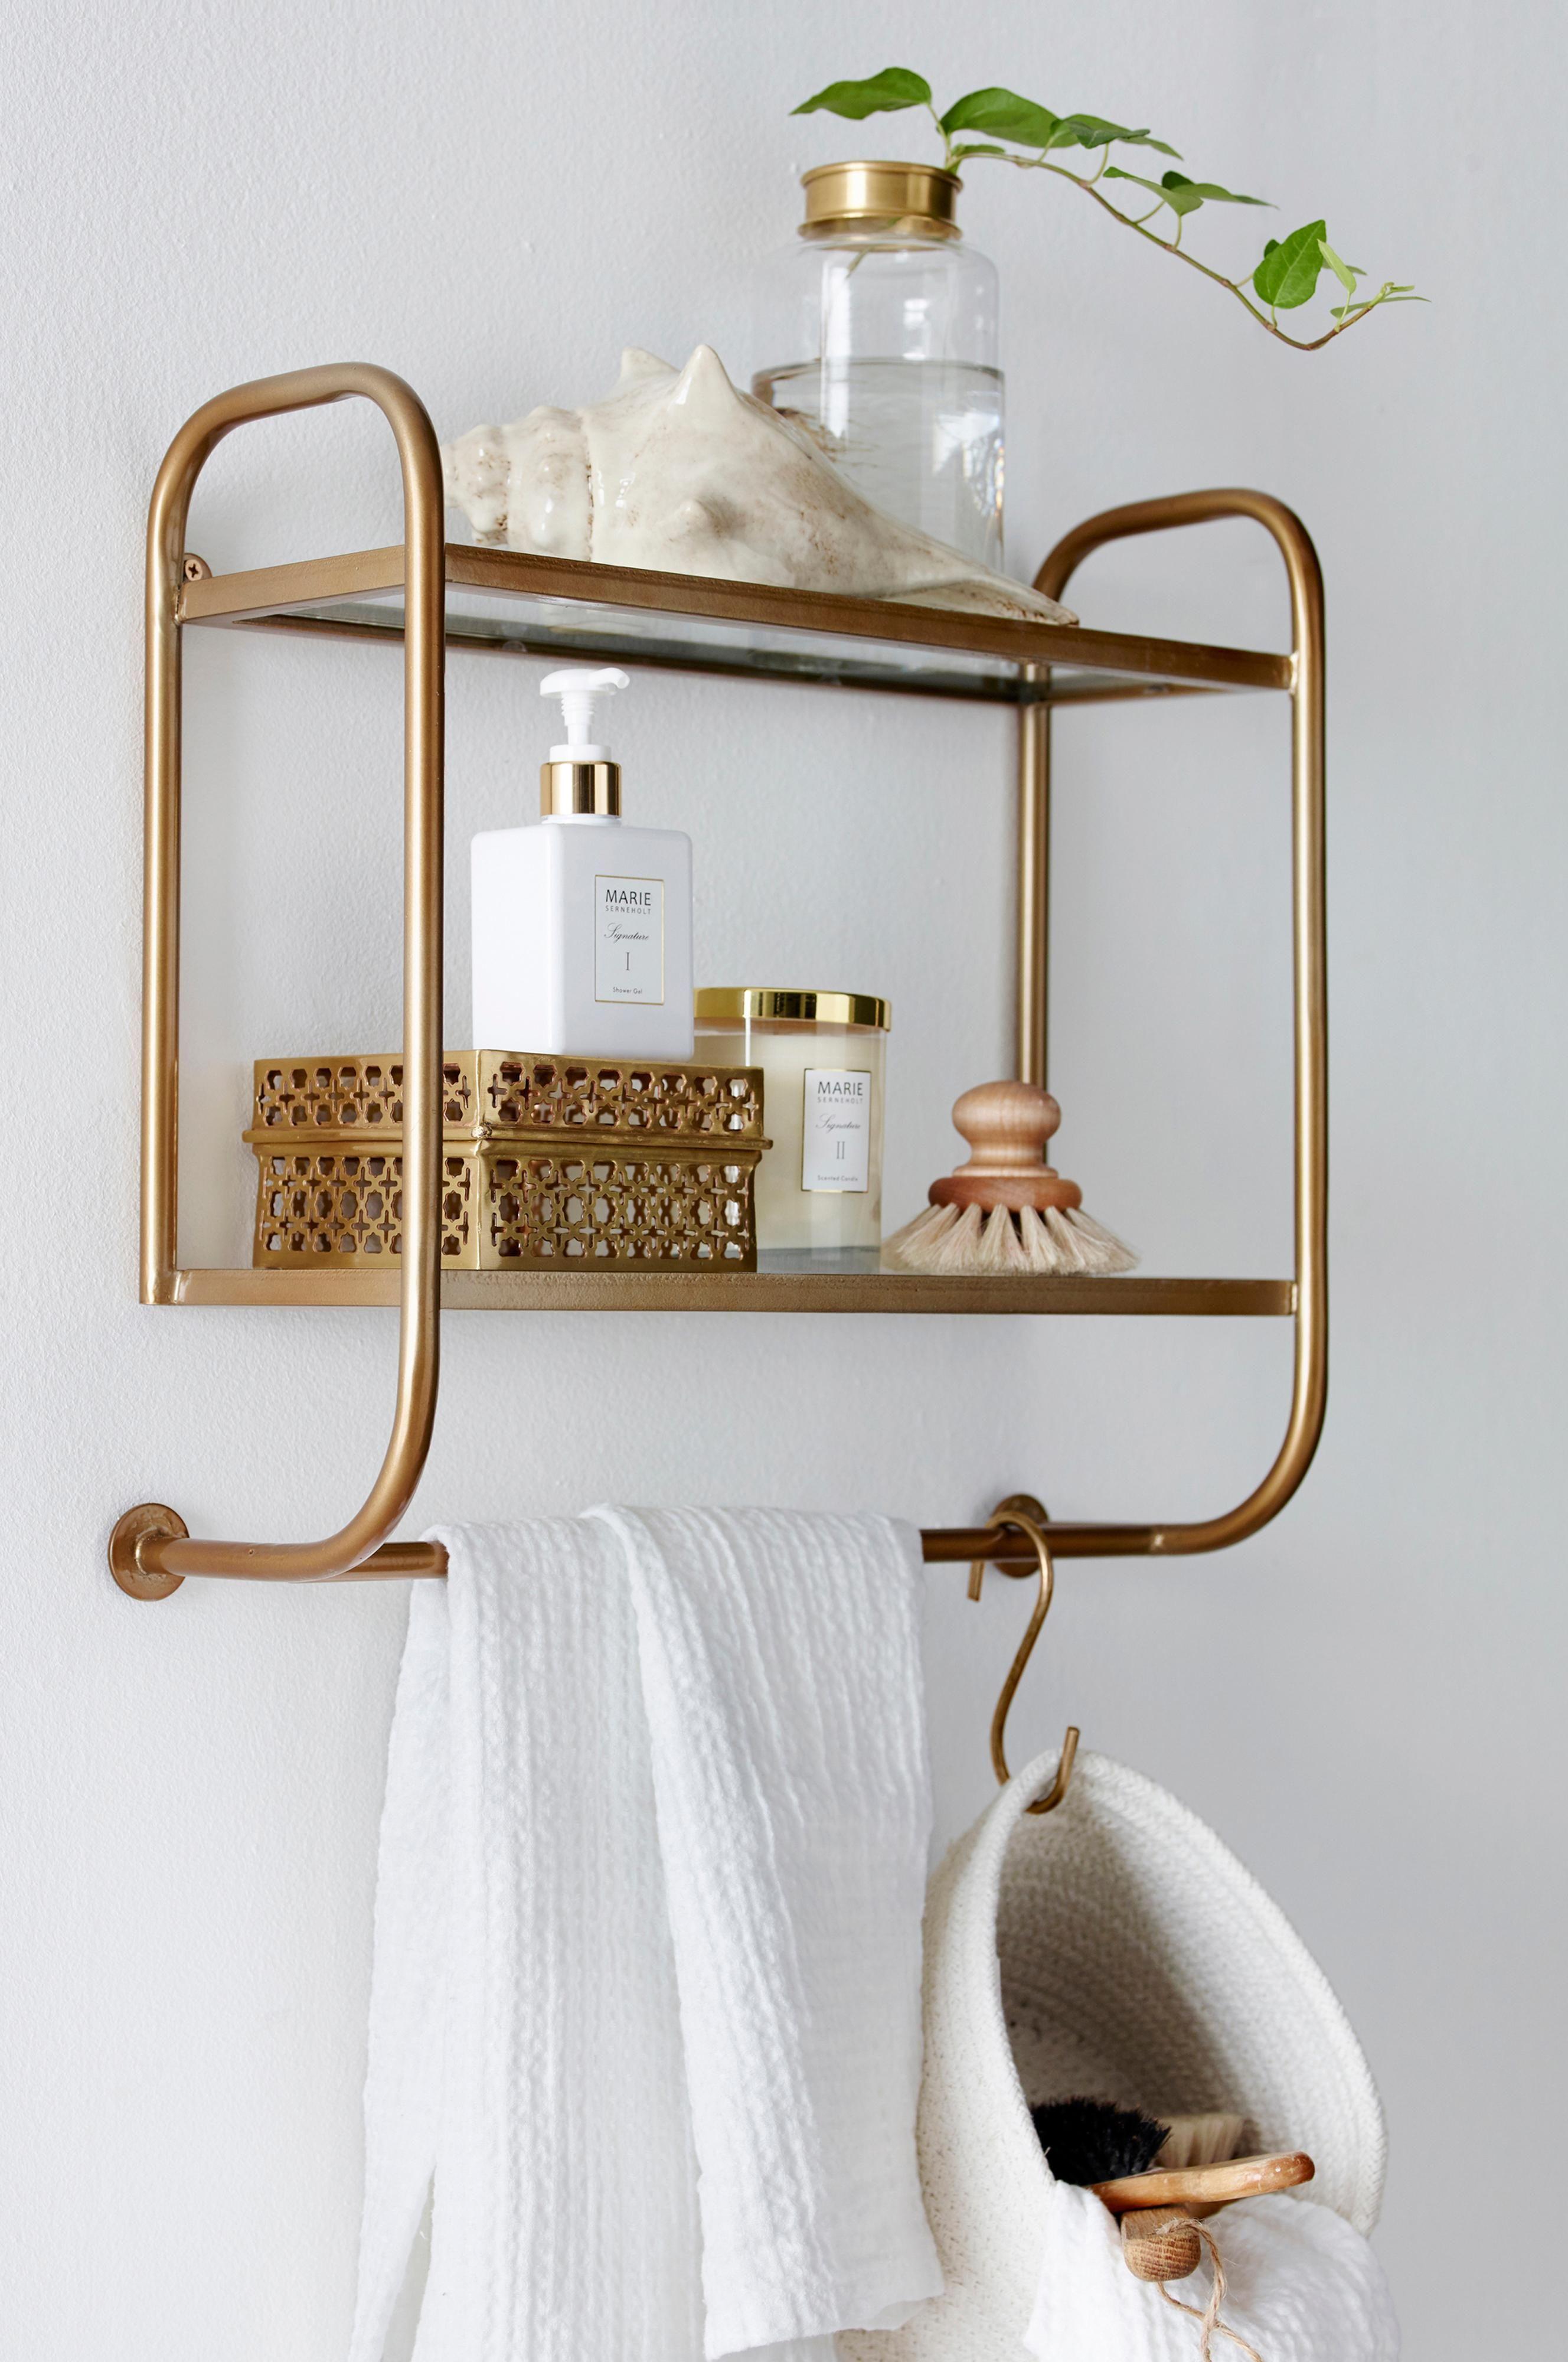 hylde badeværelse Hylde Thelma | Badeværelse | Pinterest | Bath, Small bathroom and  hylde badeværelse